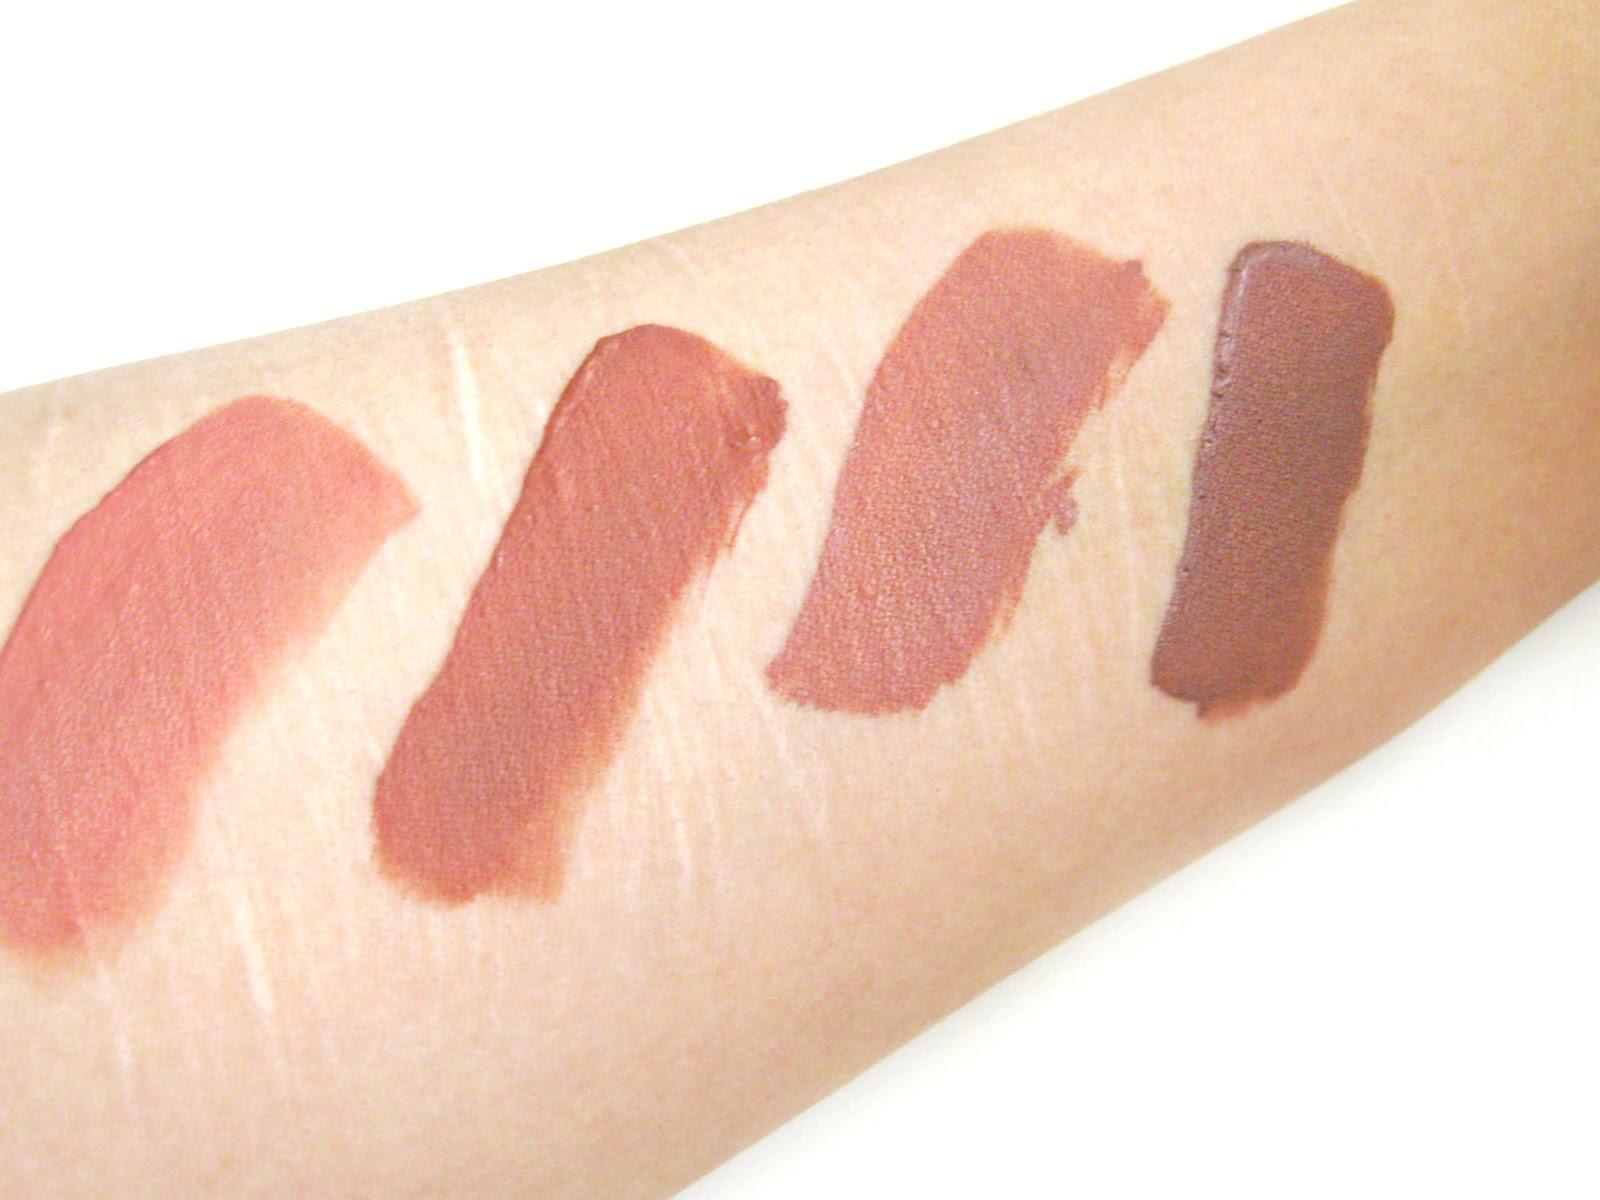 Huda Beauty, Huda Beauty lipstick, huda liquid matte, huda swathes, huda liquid matte swatches pale skin